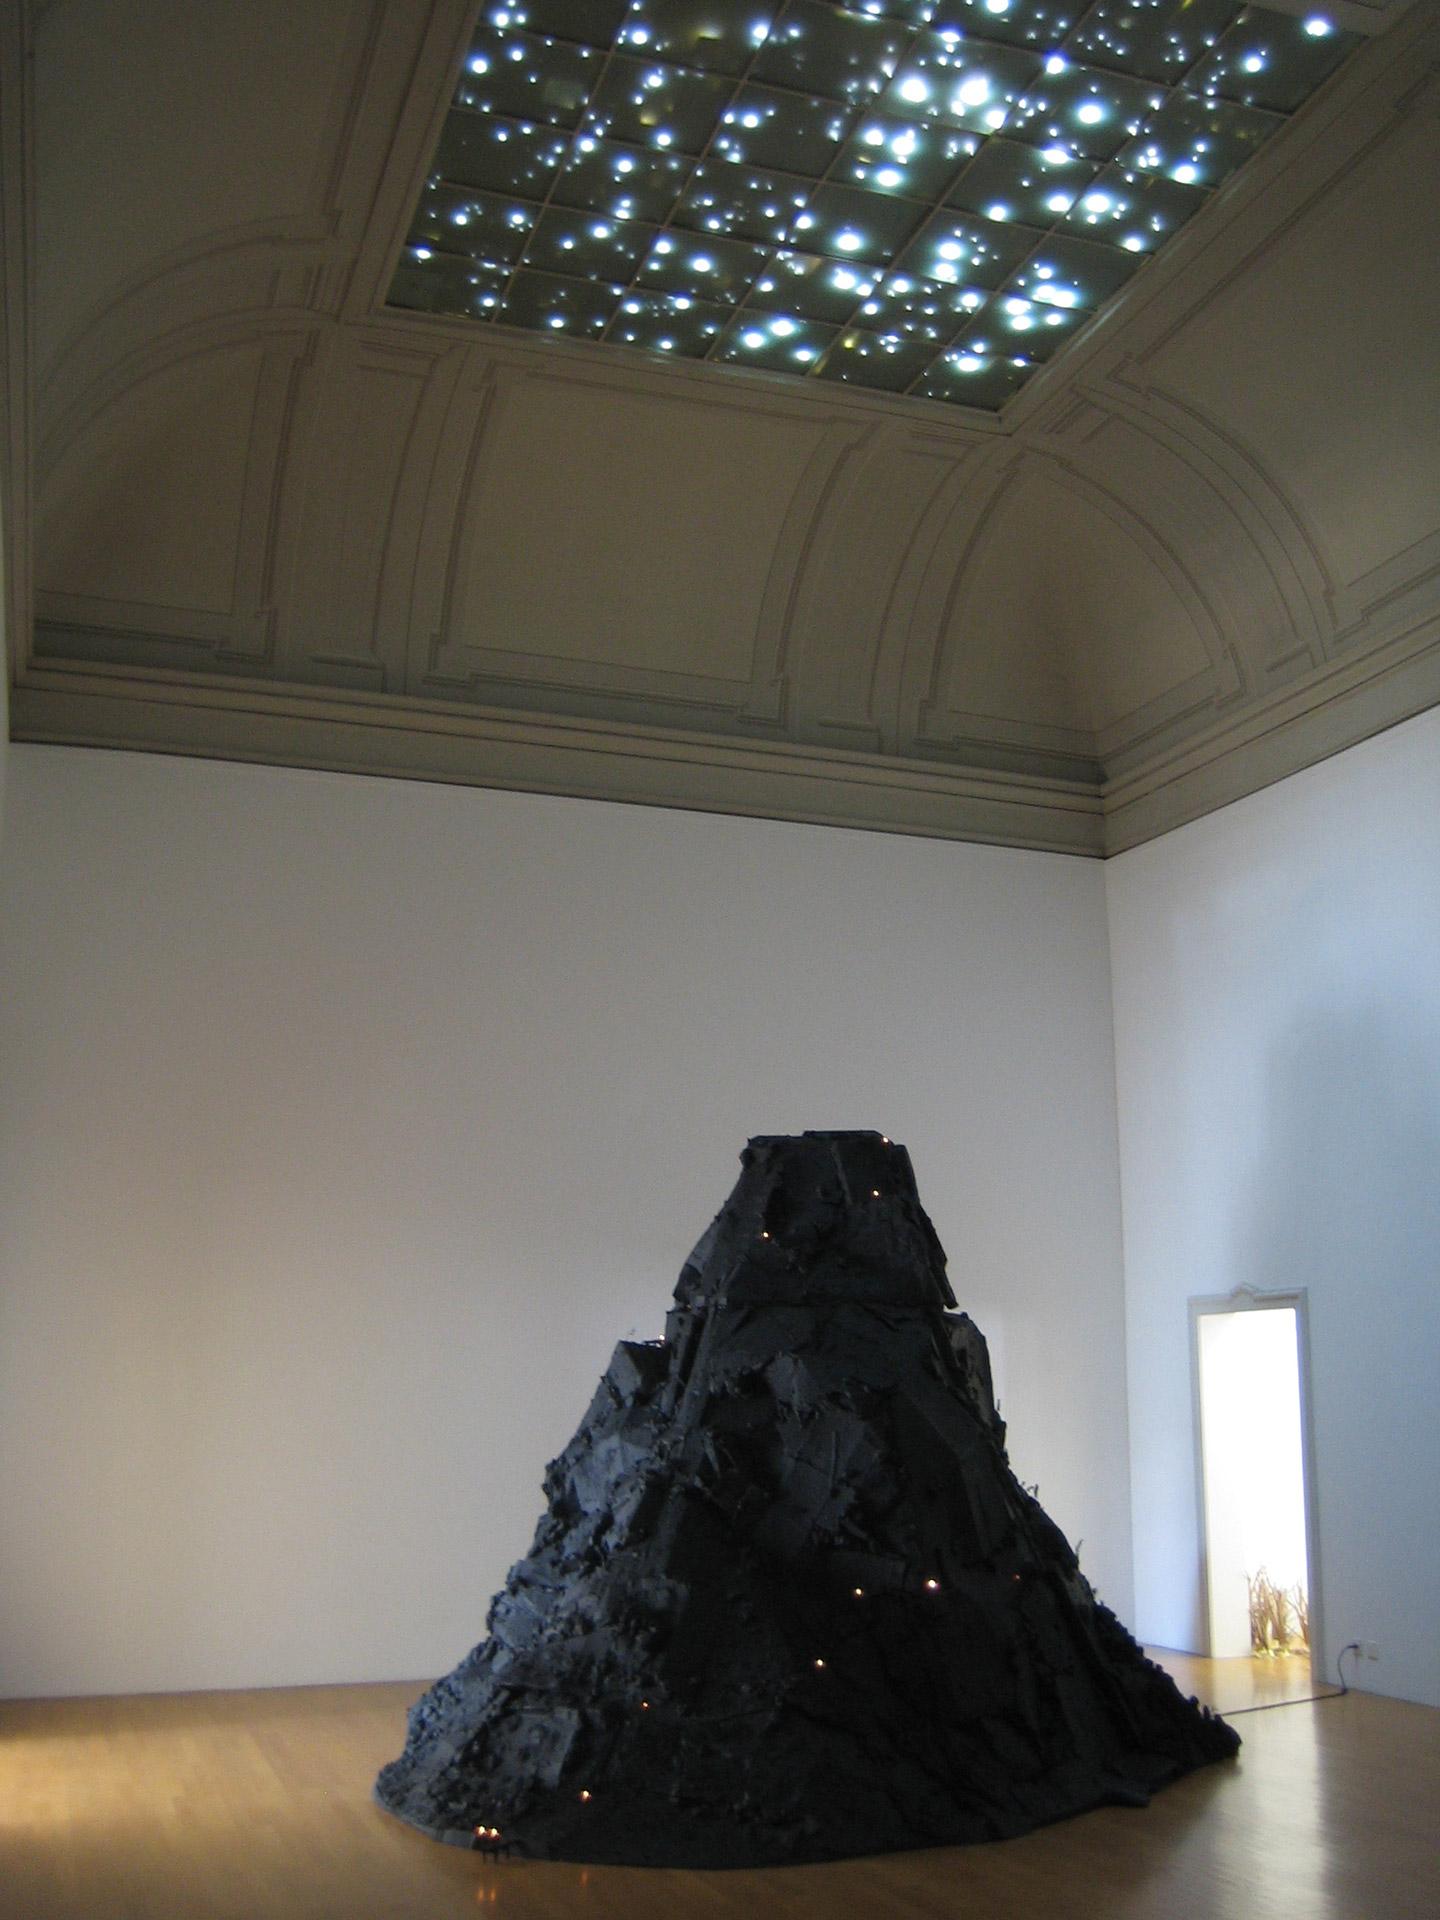 Temperli-Heim-Kunsthalle-Winterthur-2006-3.jpg